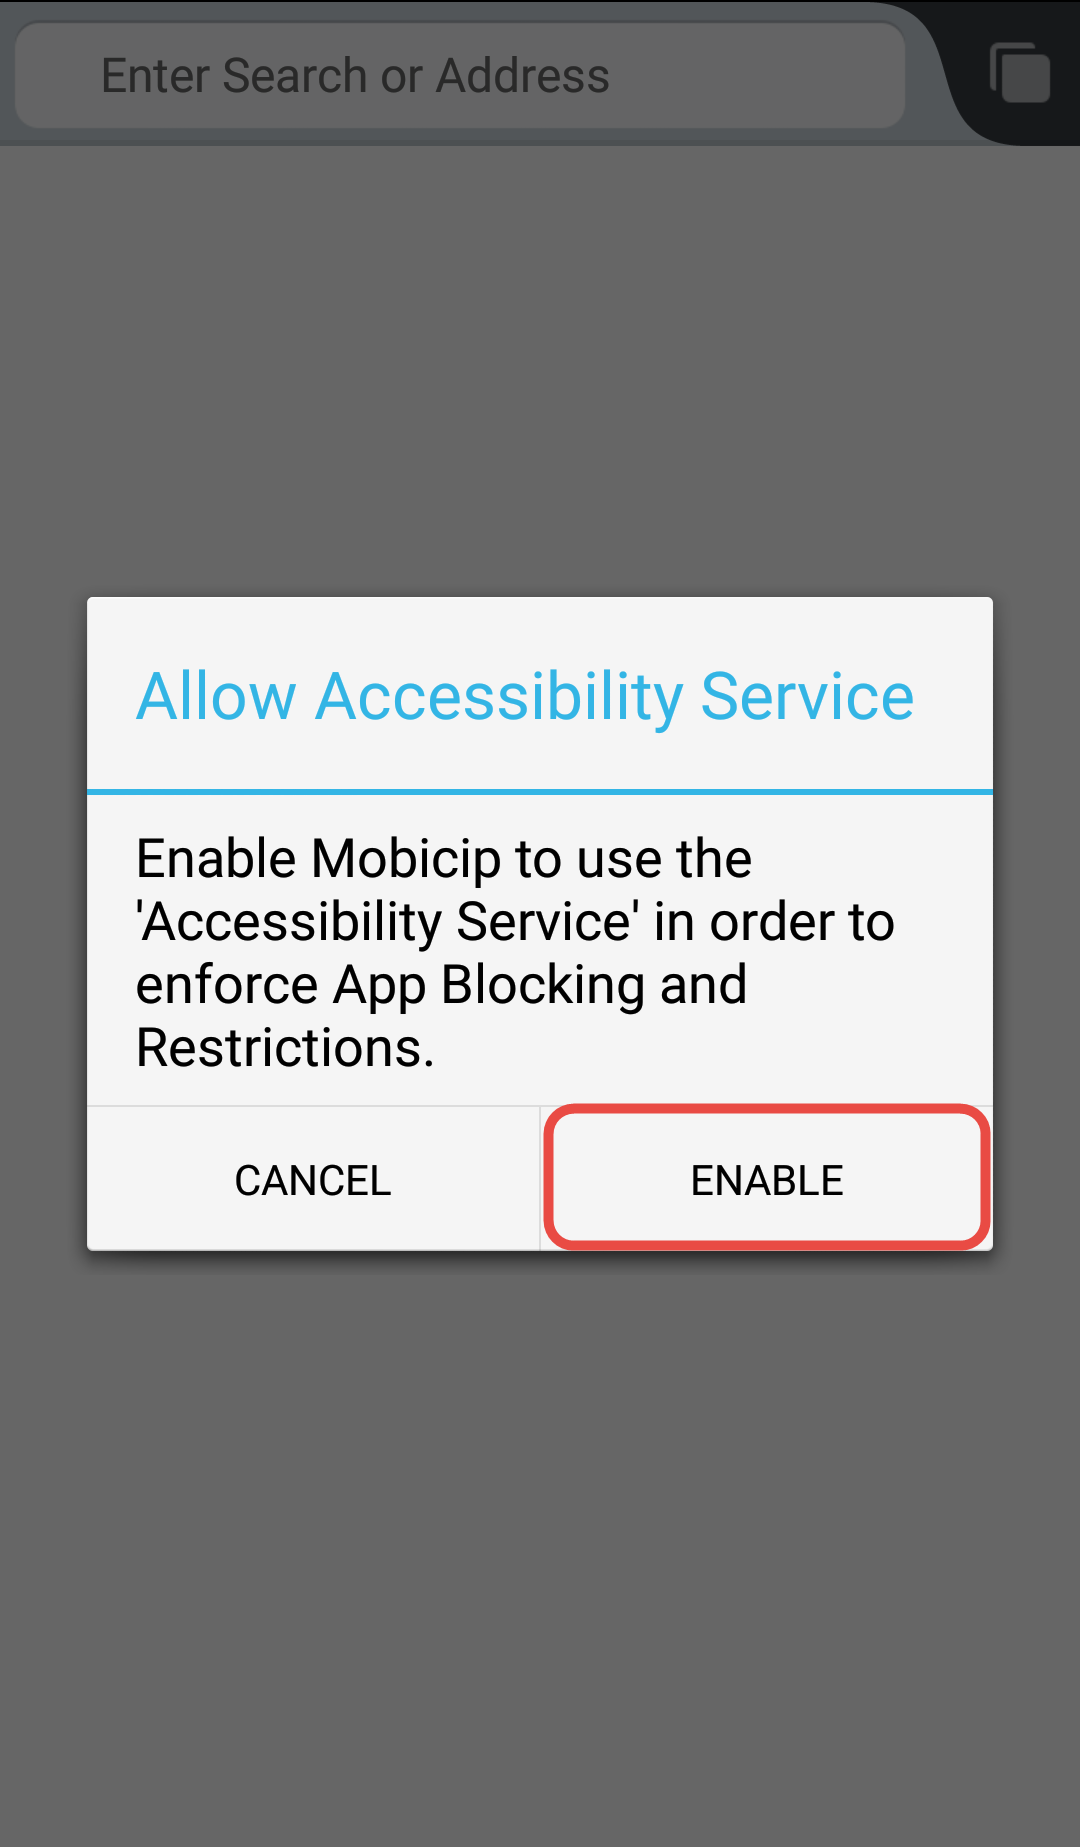 Allow accessibilty Service